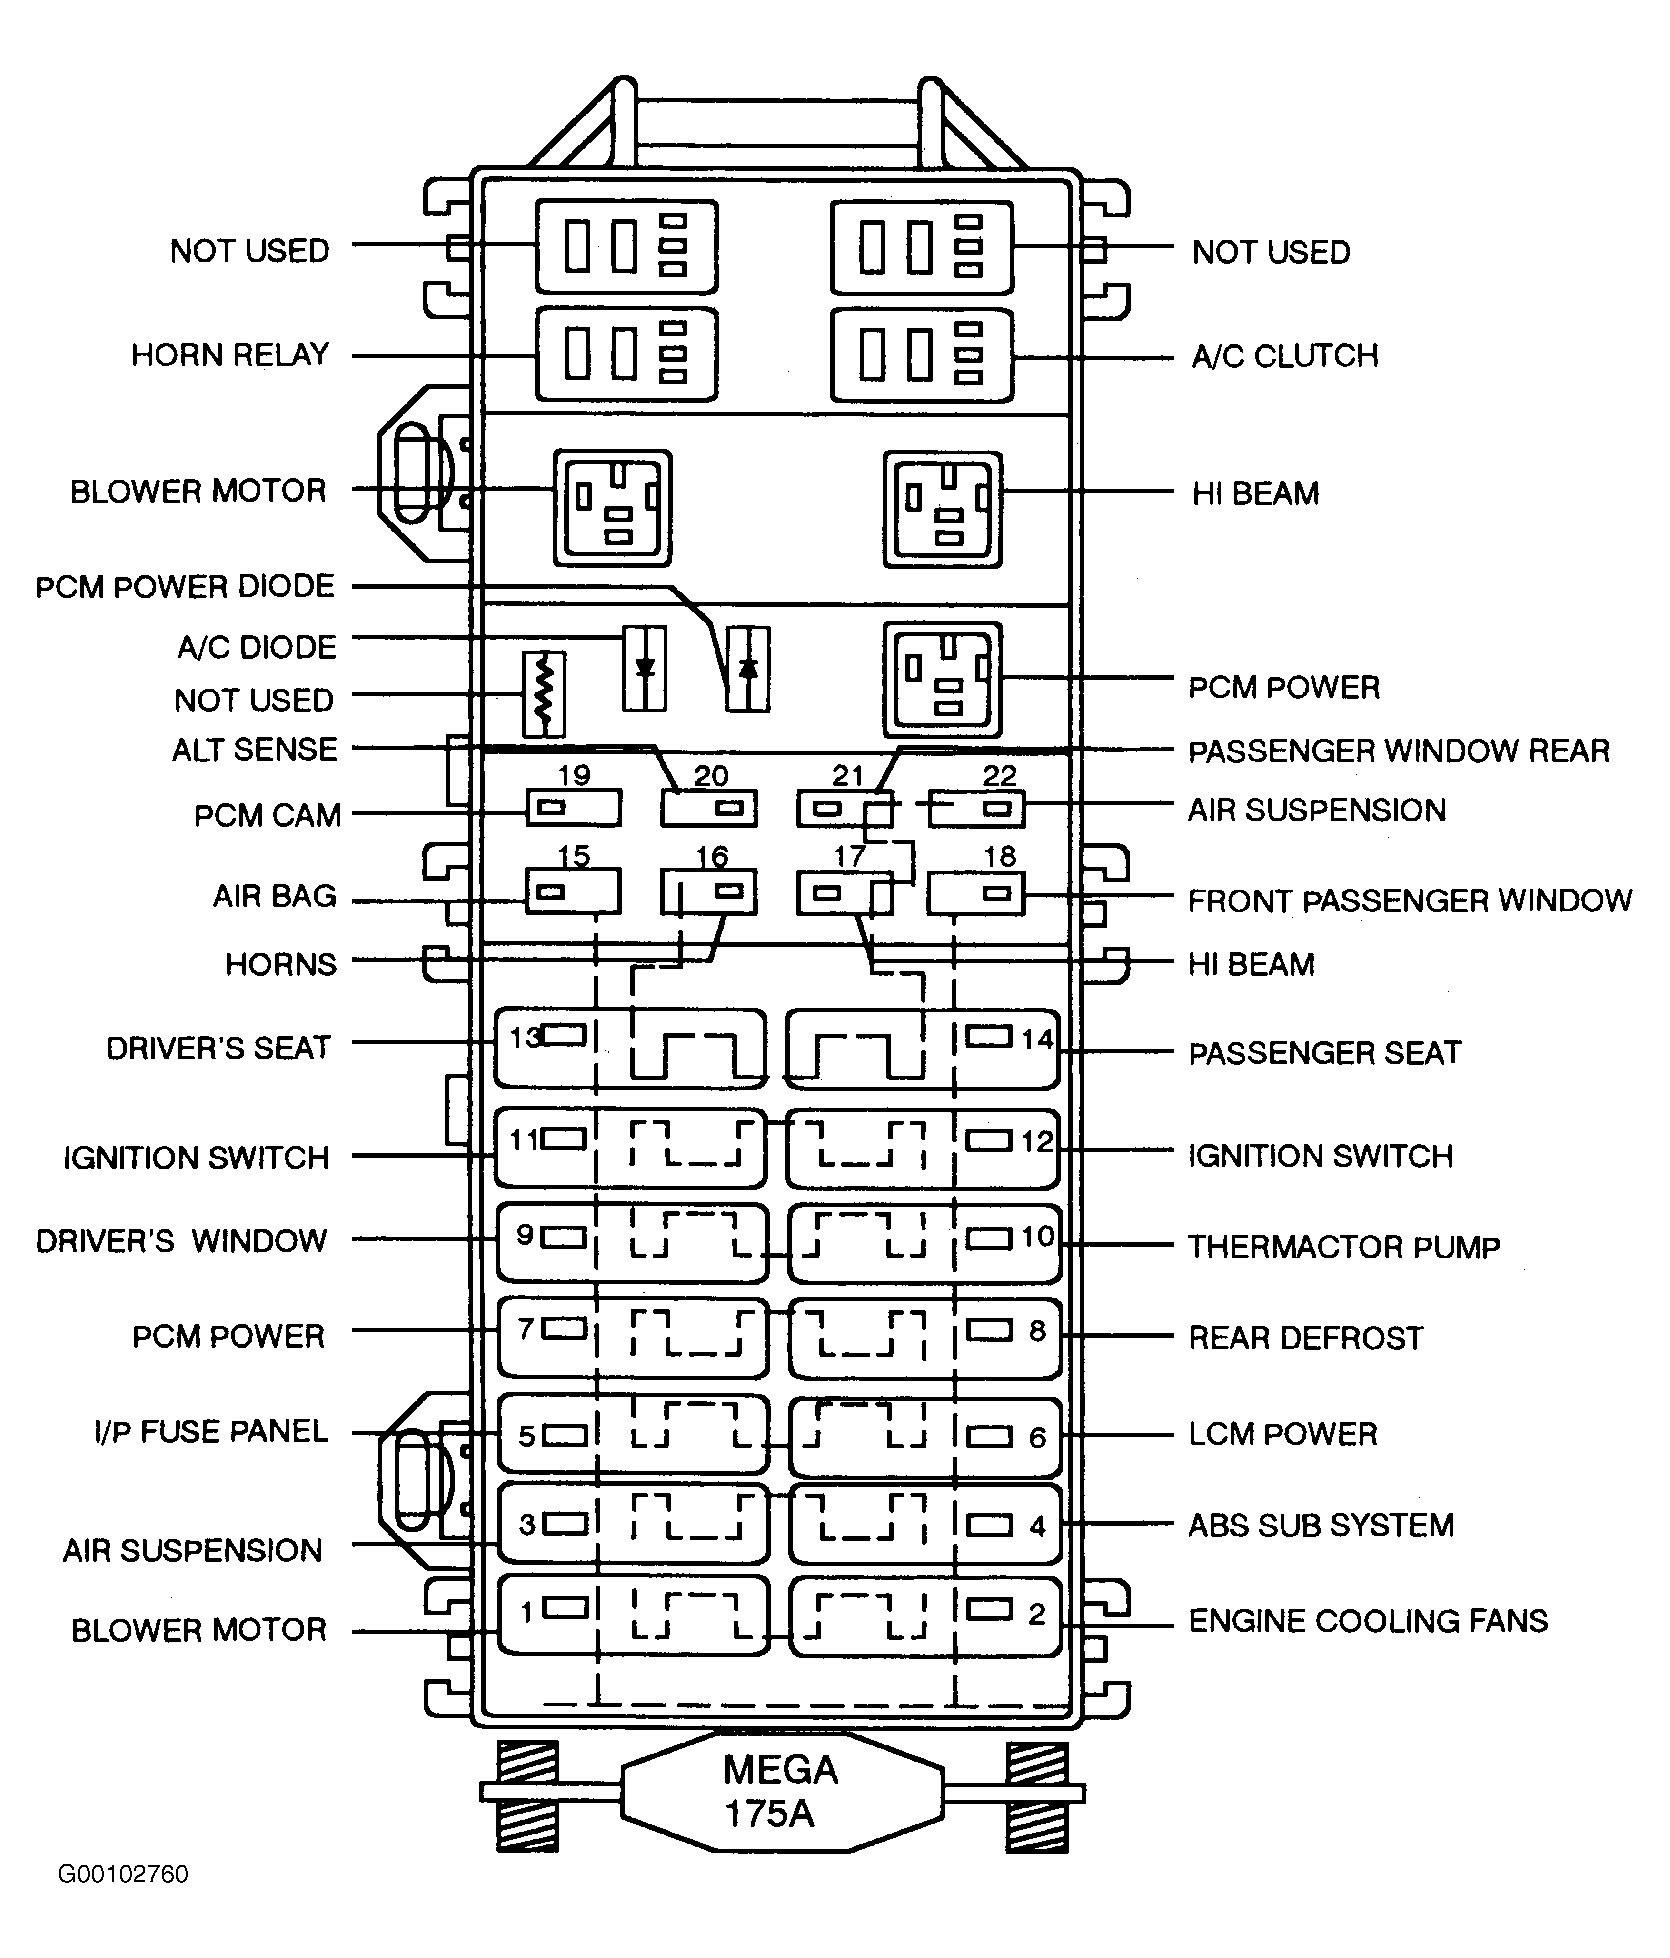 1999 Lincoln Navigator Engine Diagram - Wiring Diagram